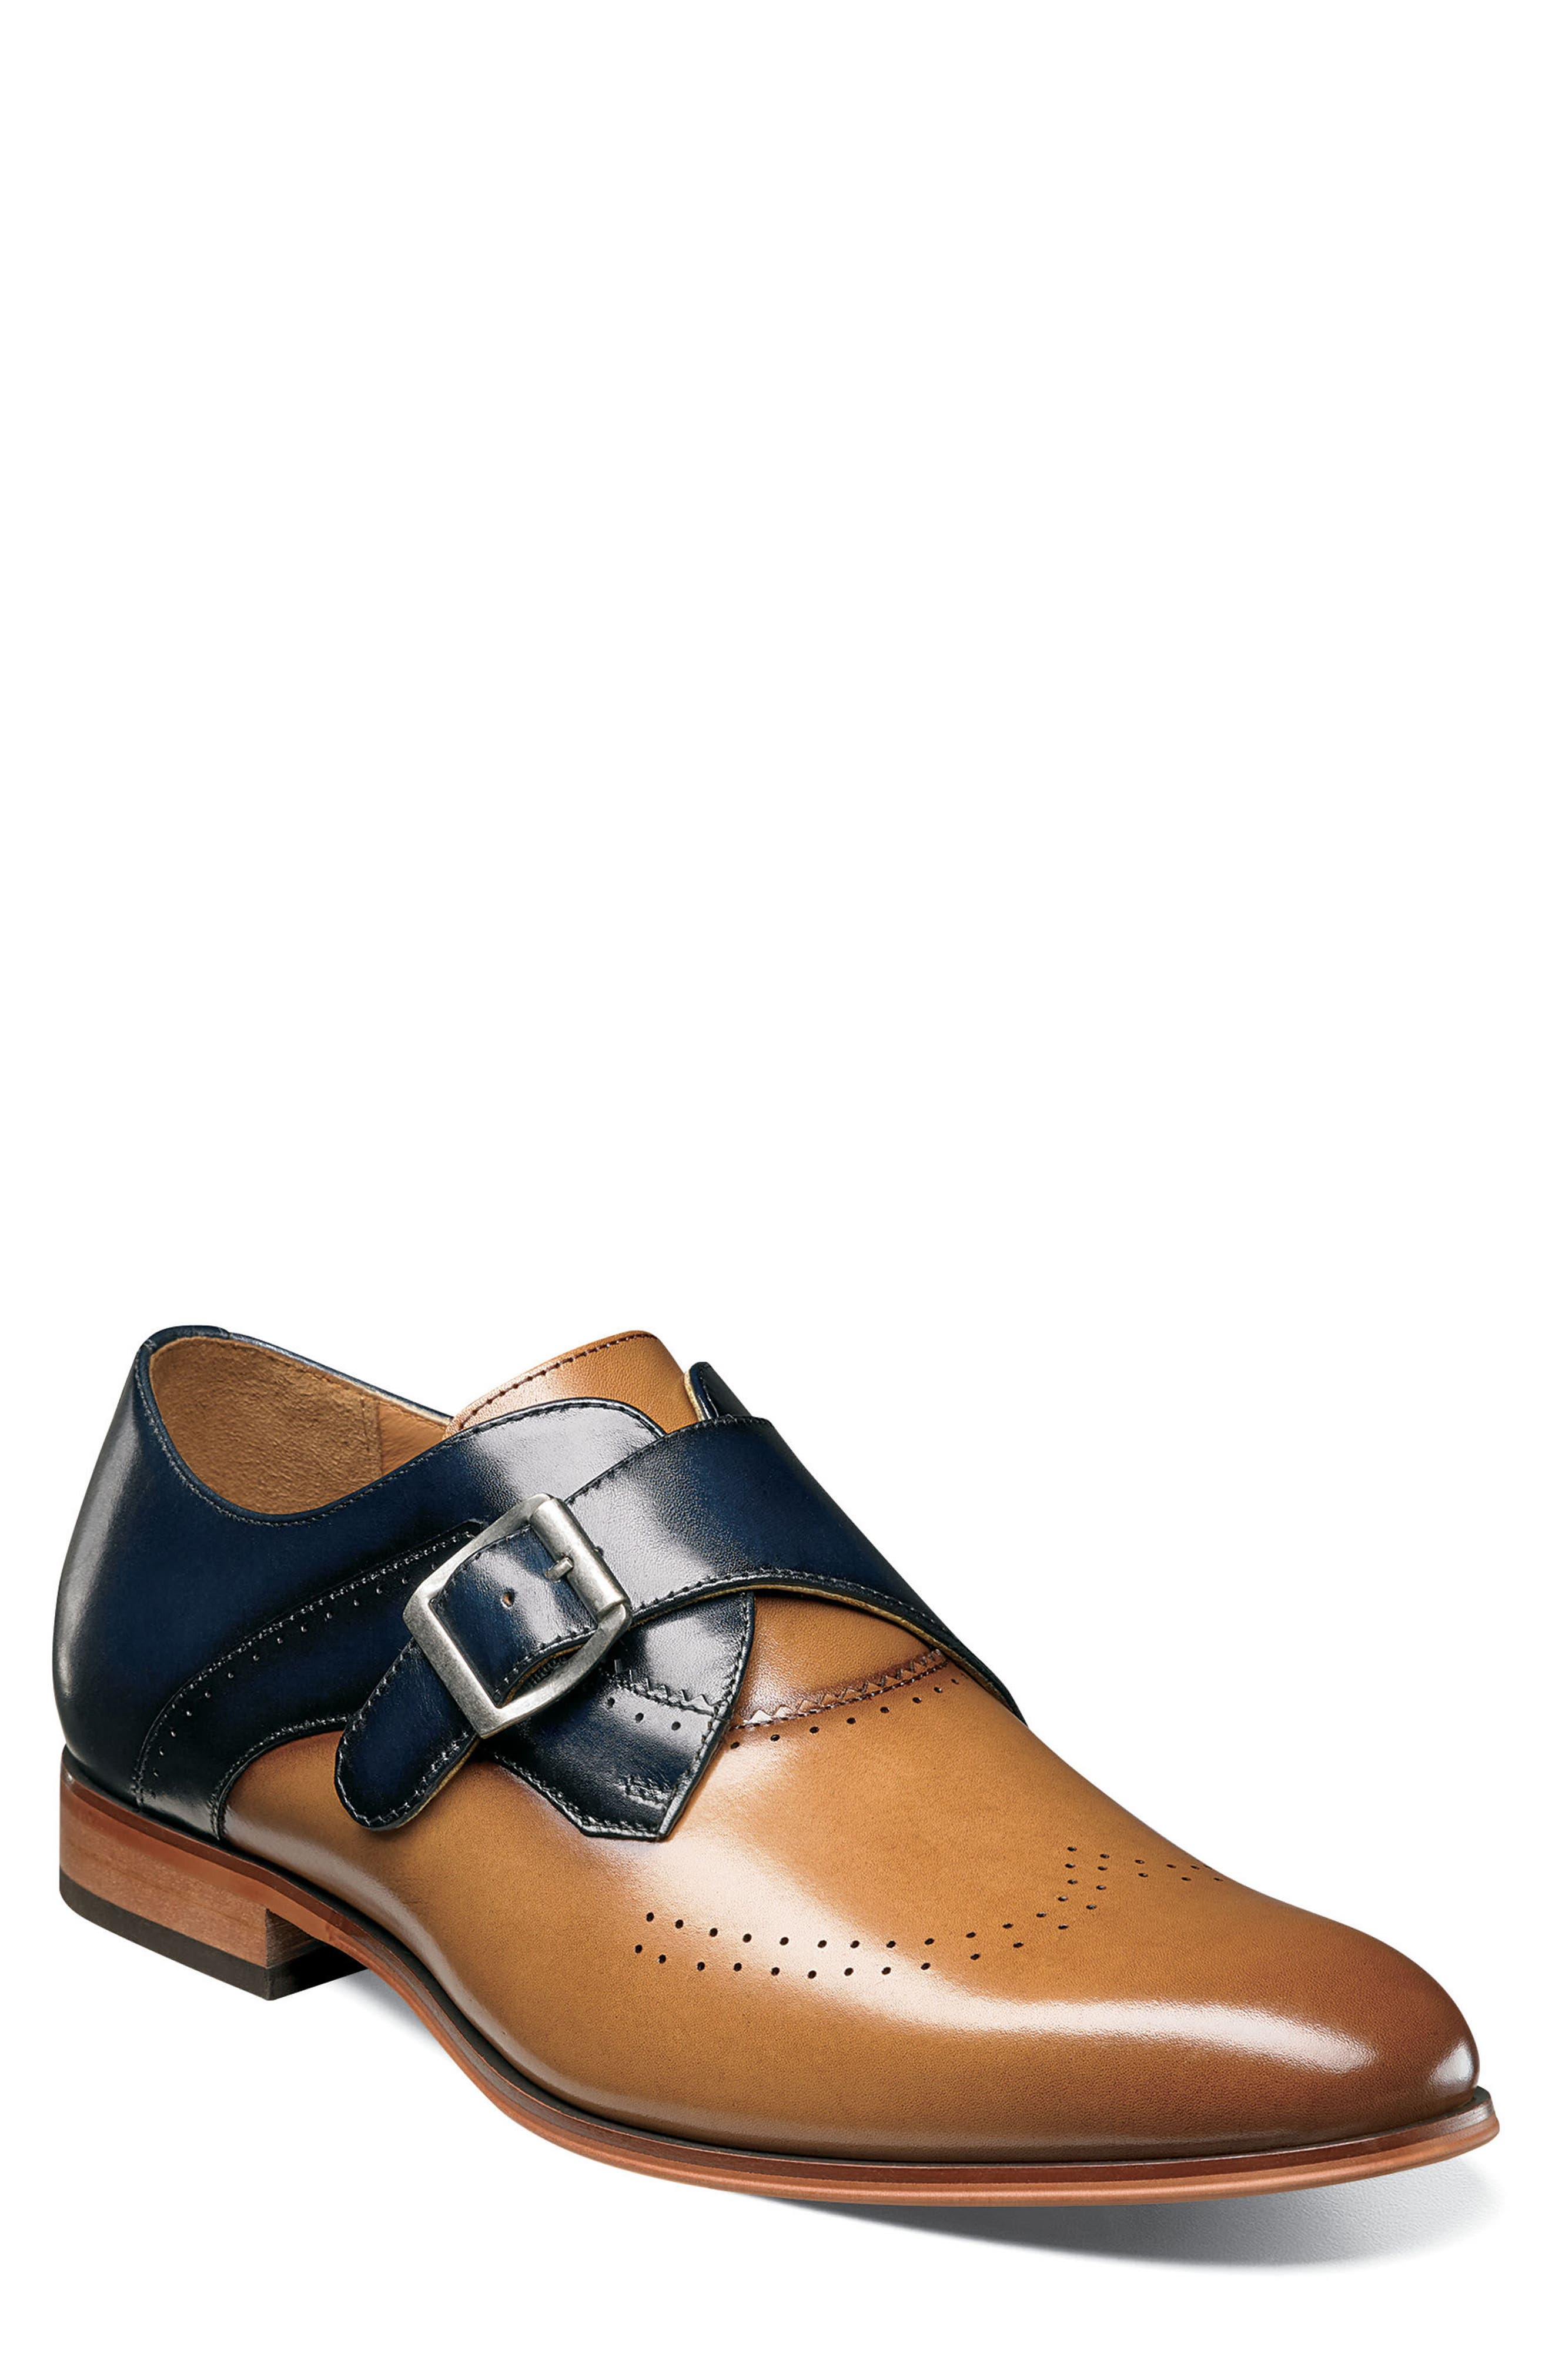 Main Image - Stacy Adams Saxon Perforated Monk Shoe (Men)